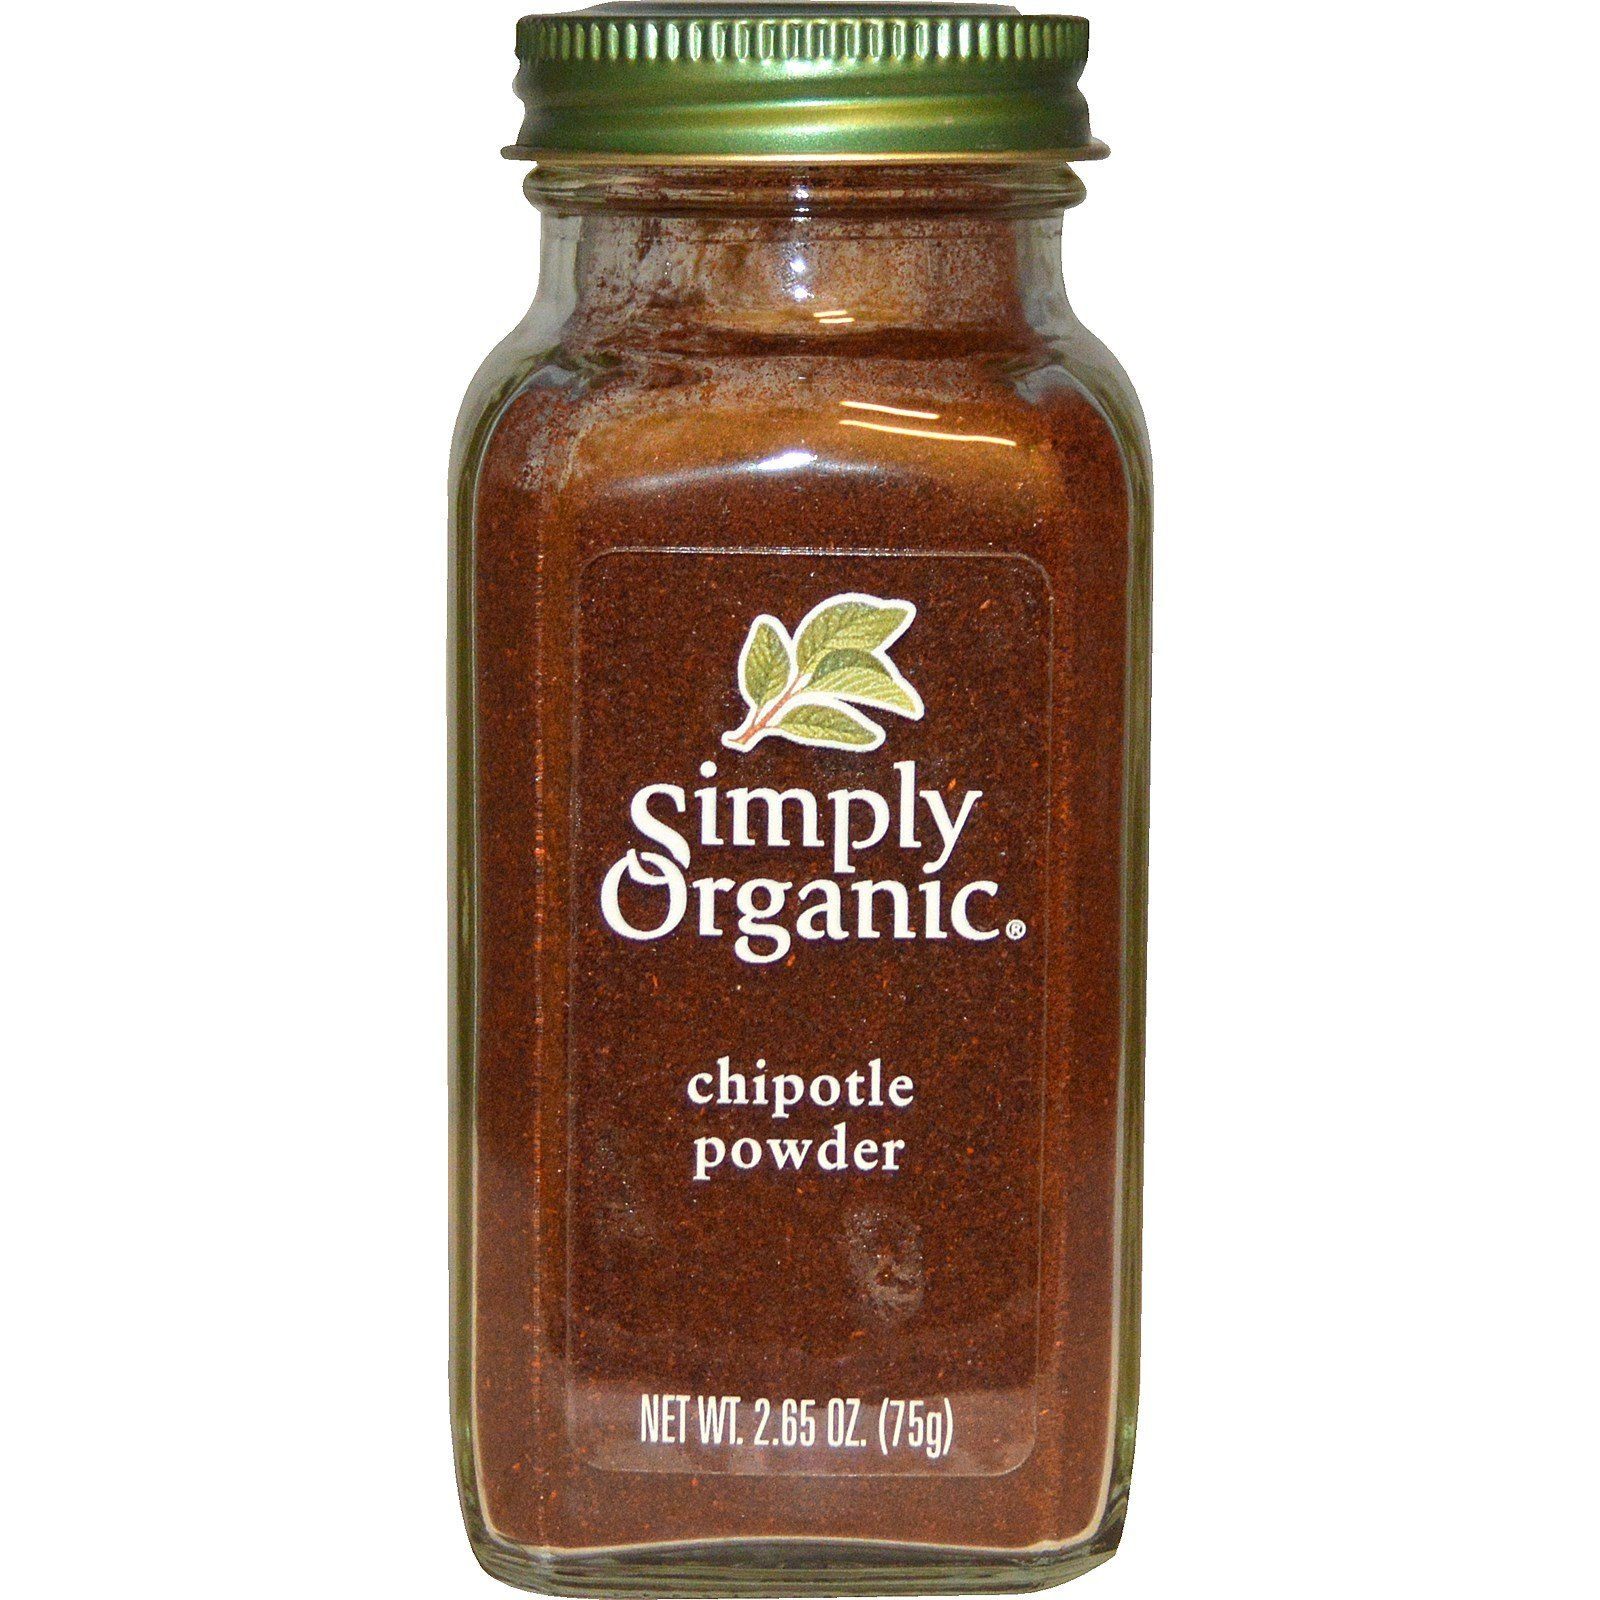 Simply Organic, Organic Chipotle Powder, 2.65 oz (75 g) Simply Organic, Organic Chipotle Powder, 2.65 oz (75 g) - 2pcs